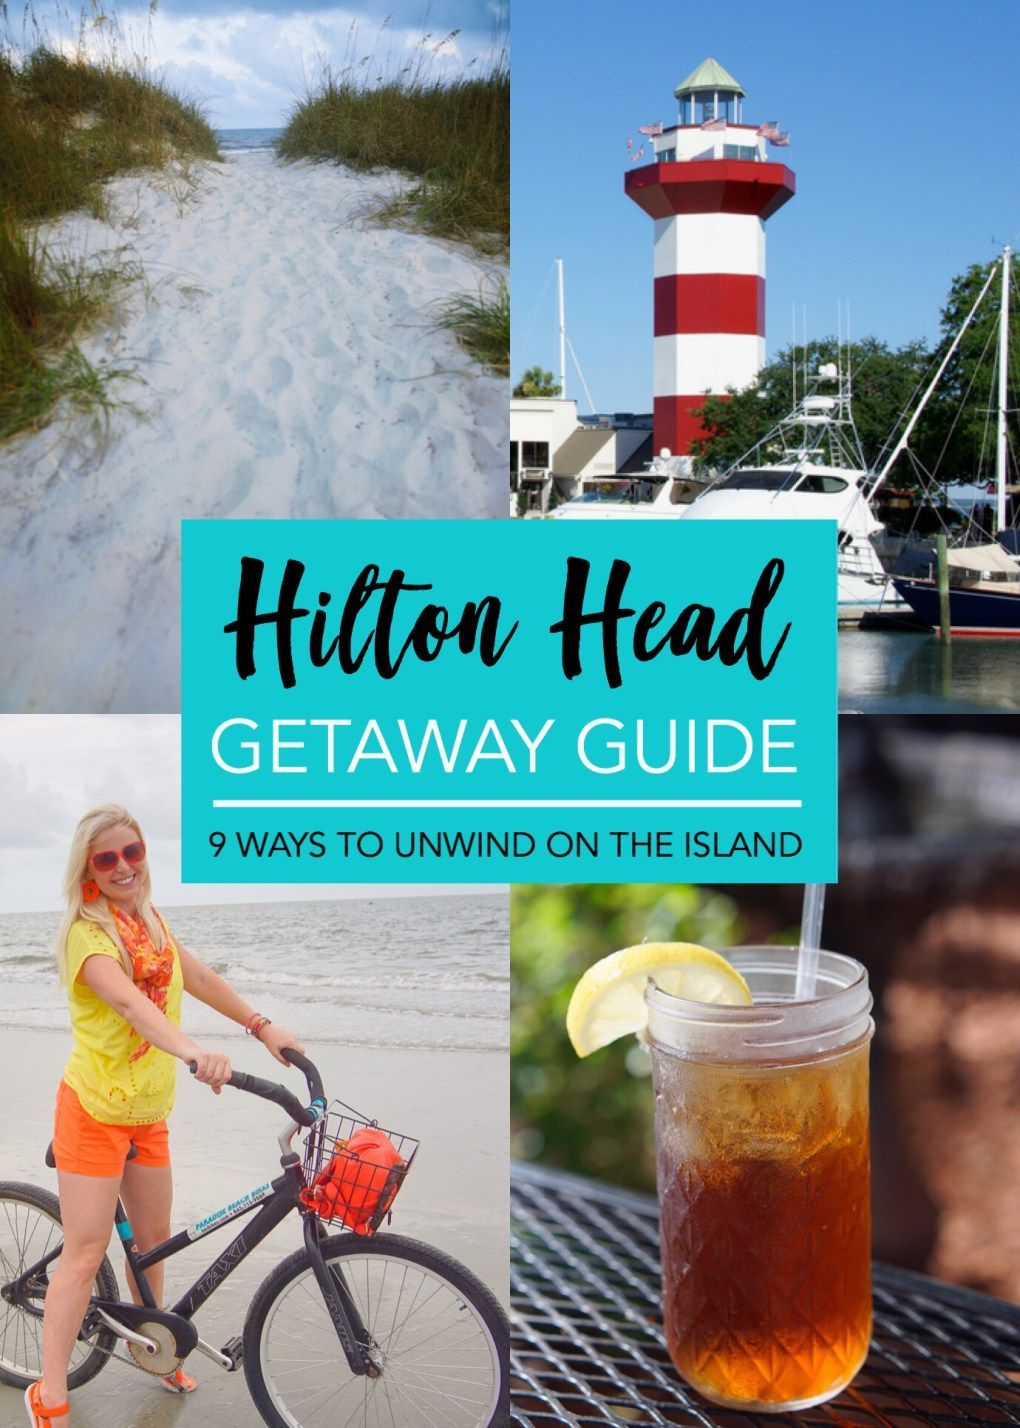 Hilton Head Getaway Guide 9 Ways To Unwind On The Island Family